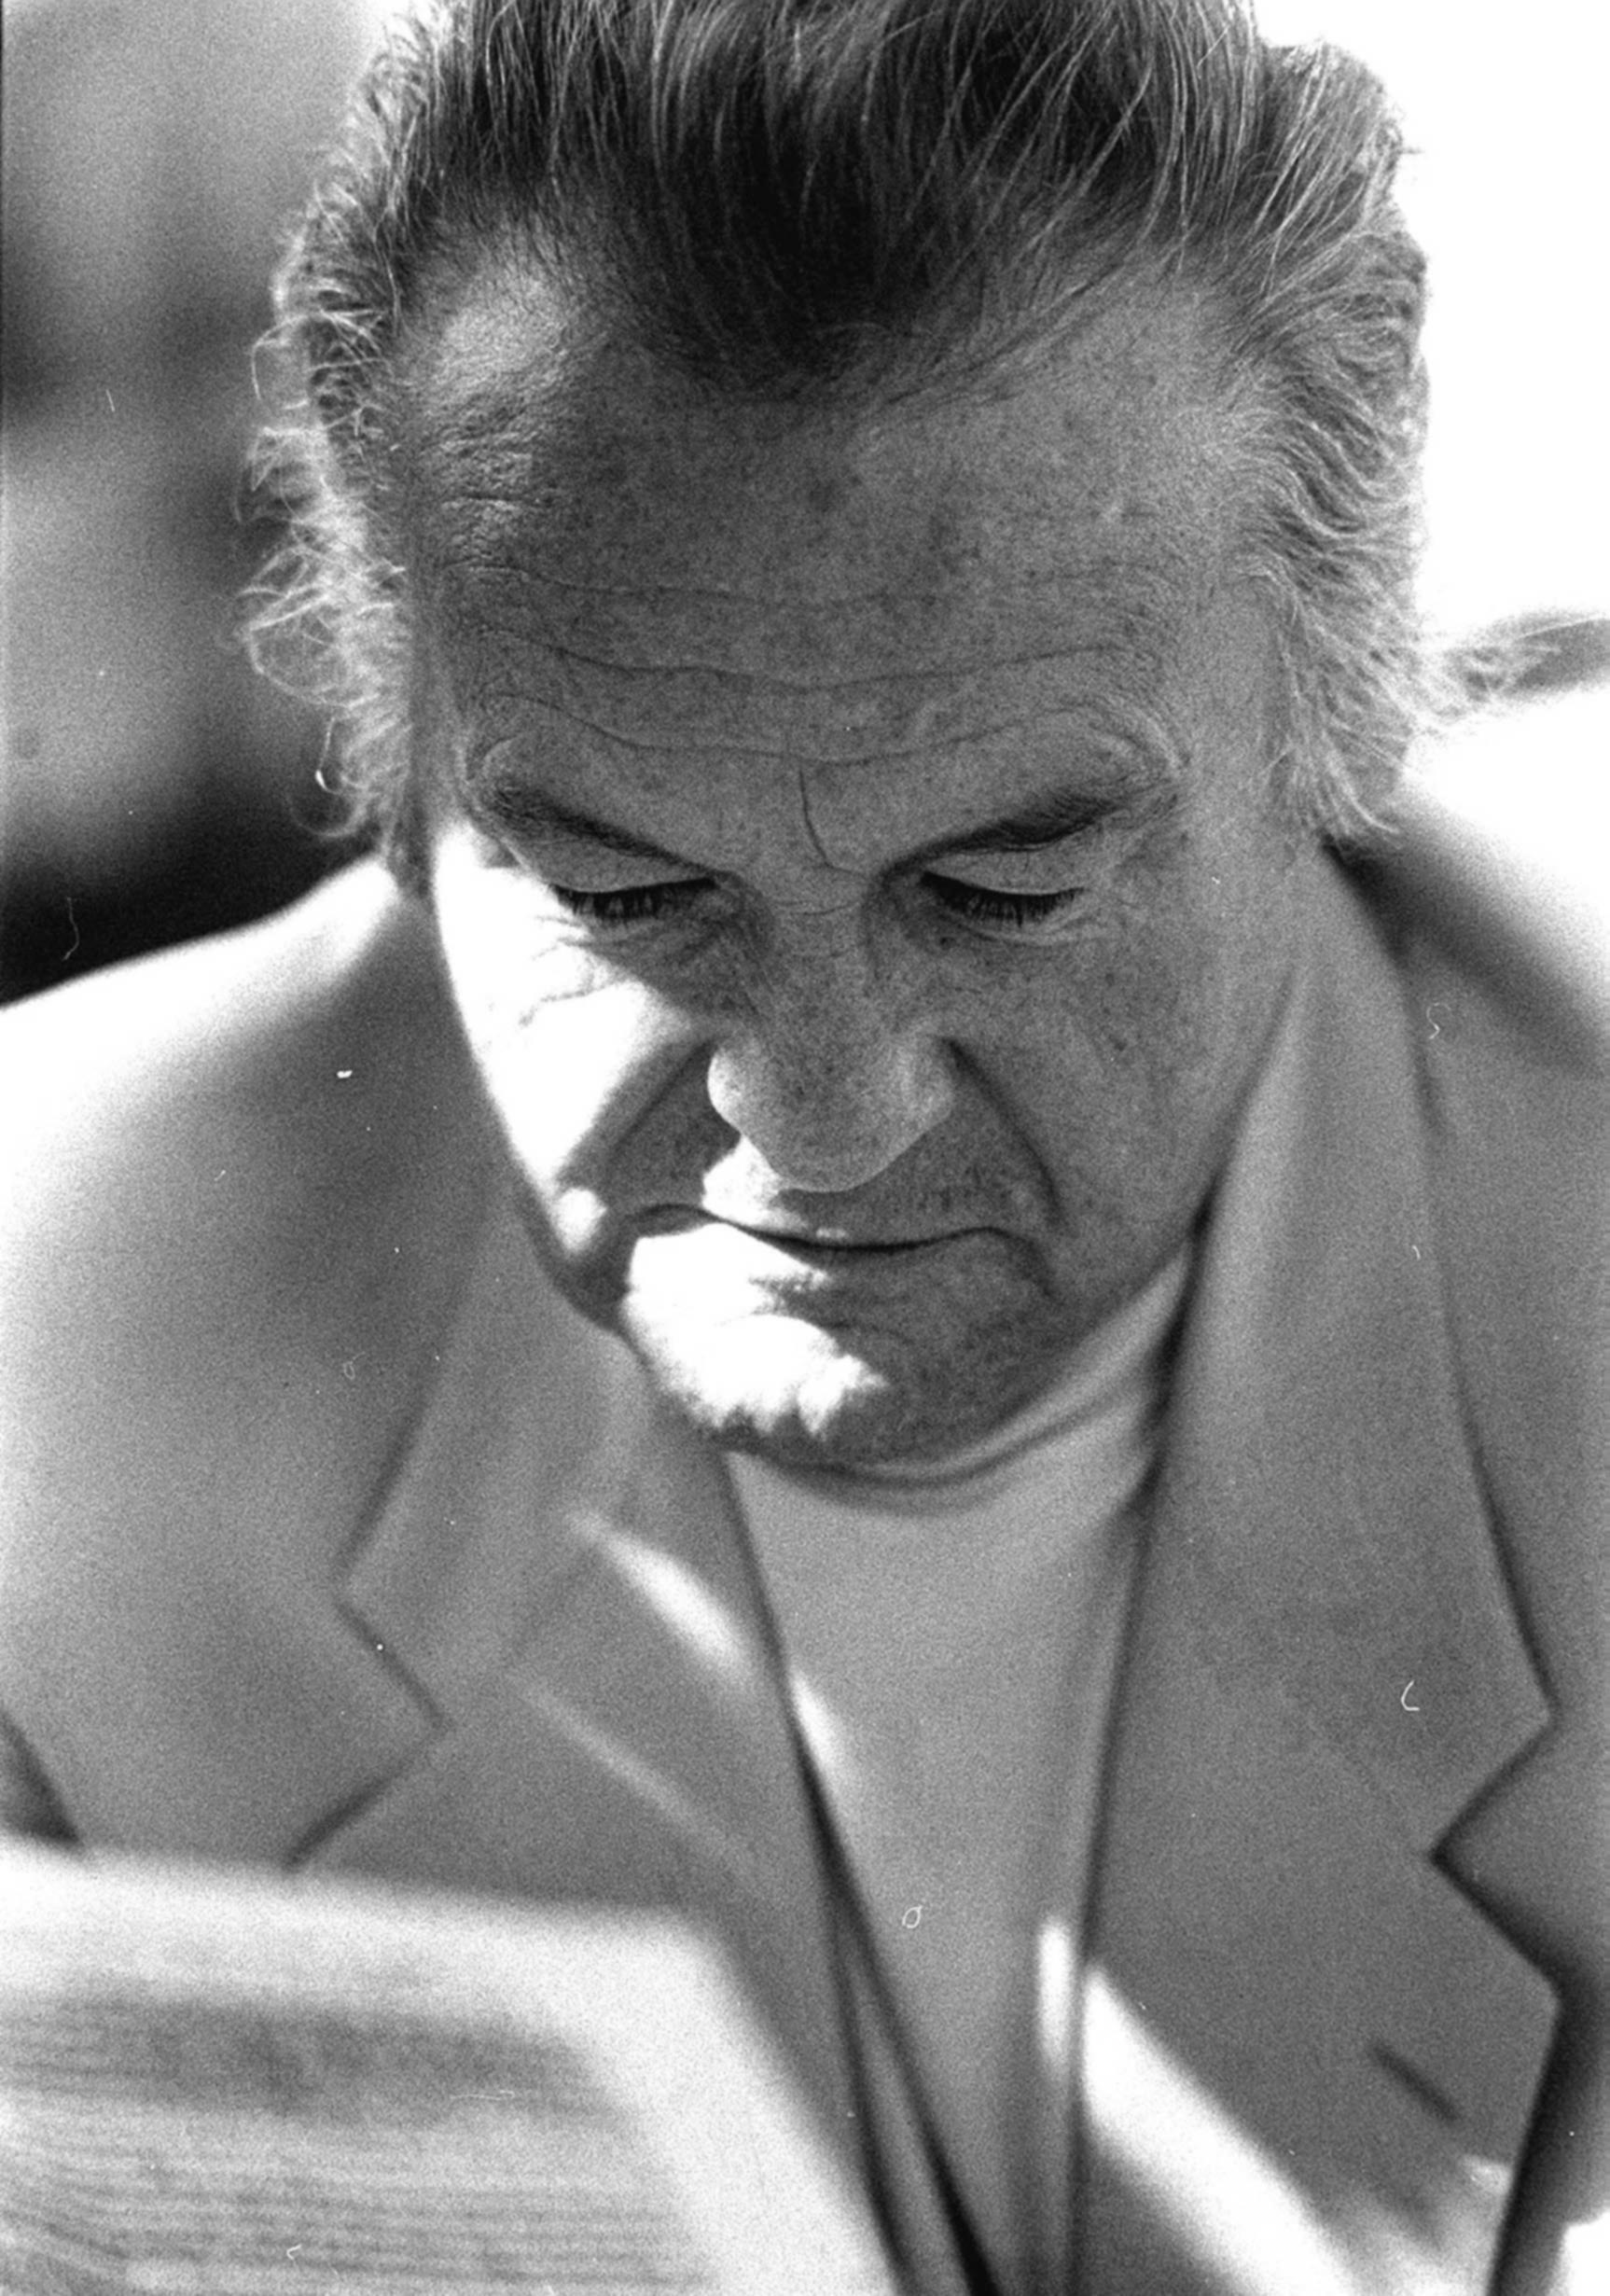 Photo Jerzy Skolimowski via Opendata BNF